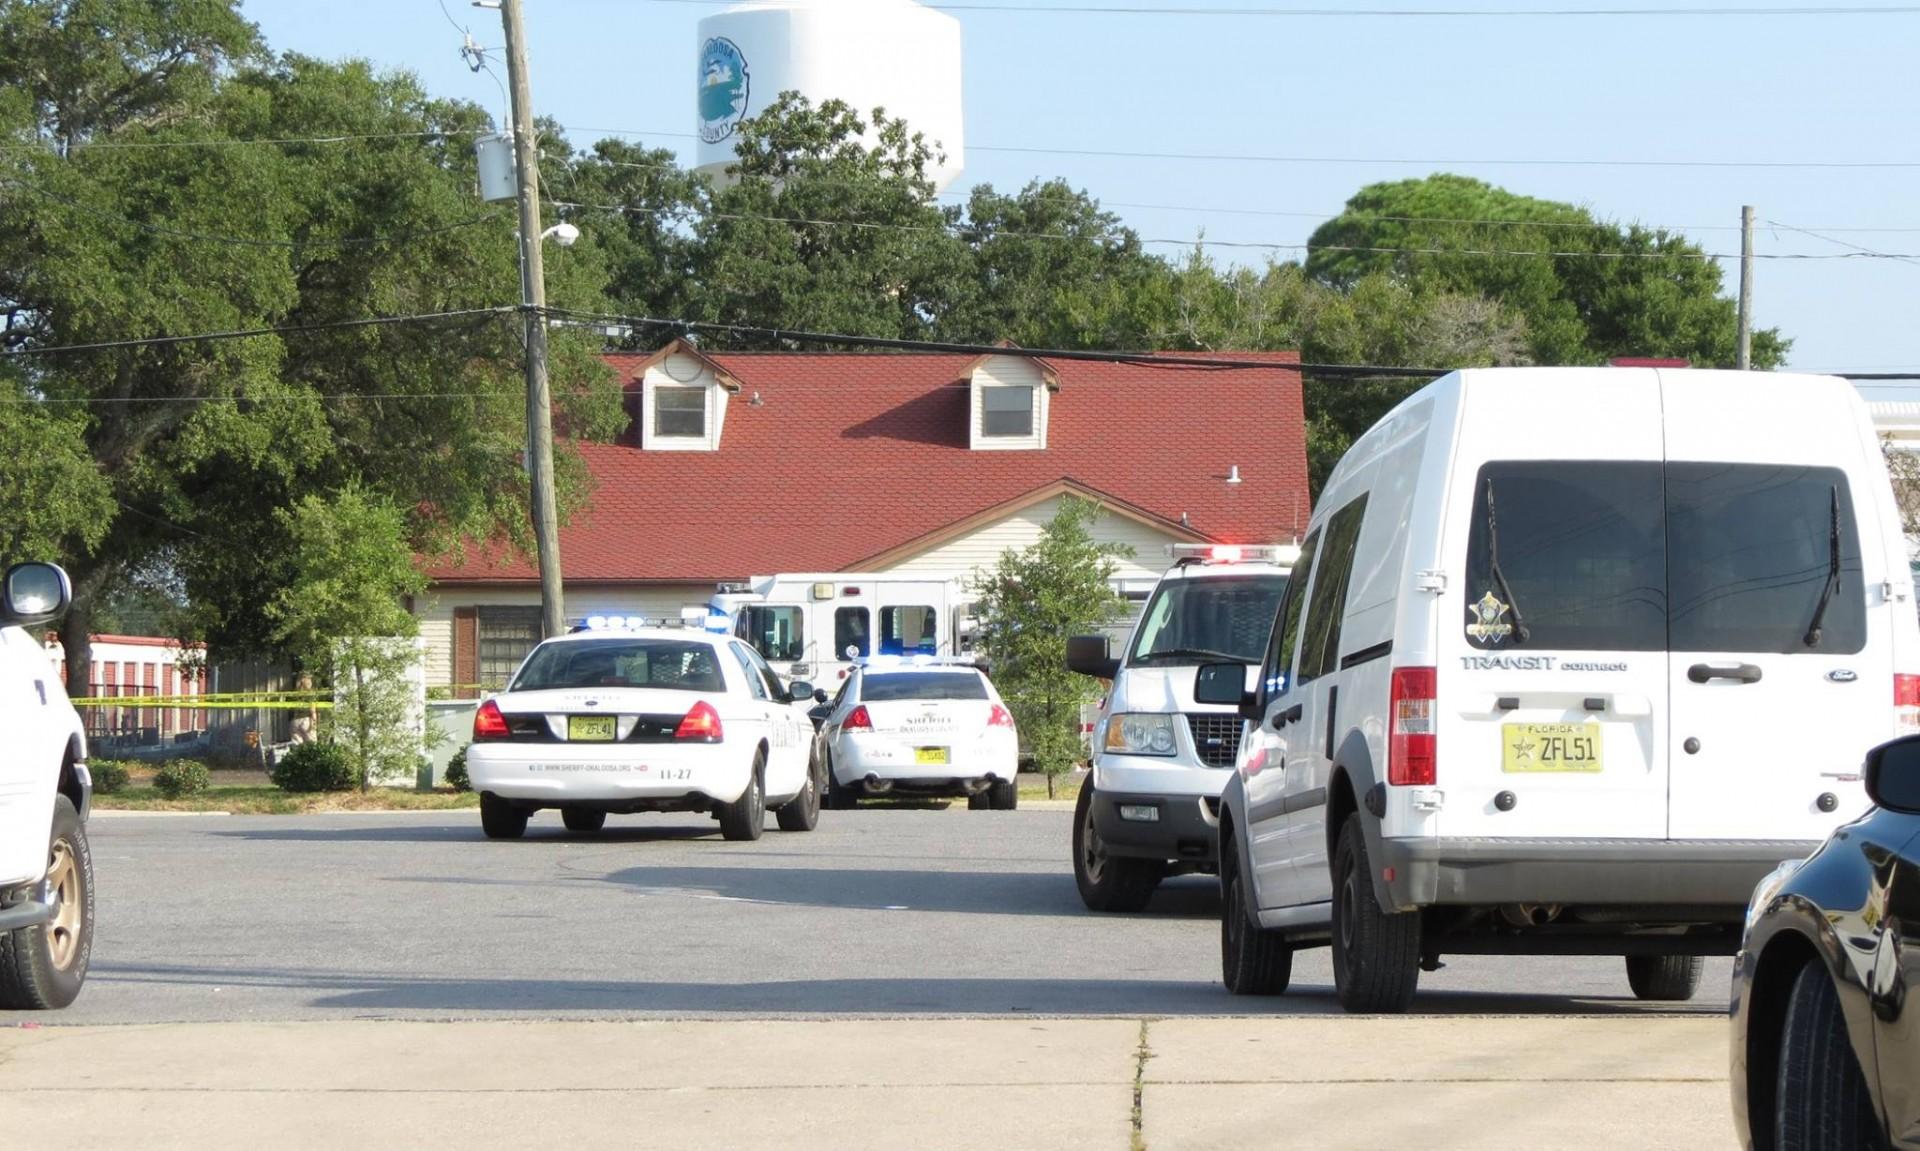 Okaloosa County Sheriff's Deputy Shot In Shalimar, FL – UPDATED